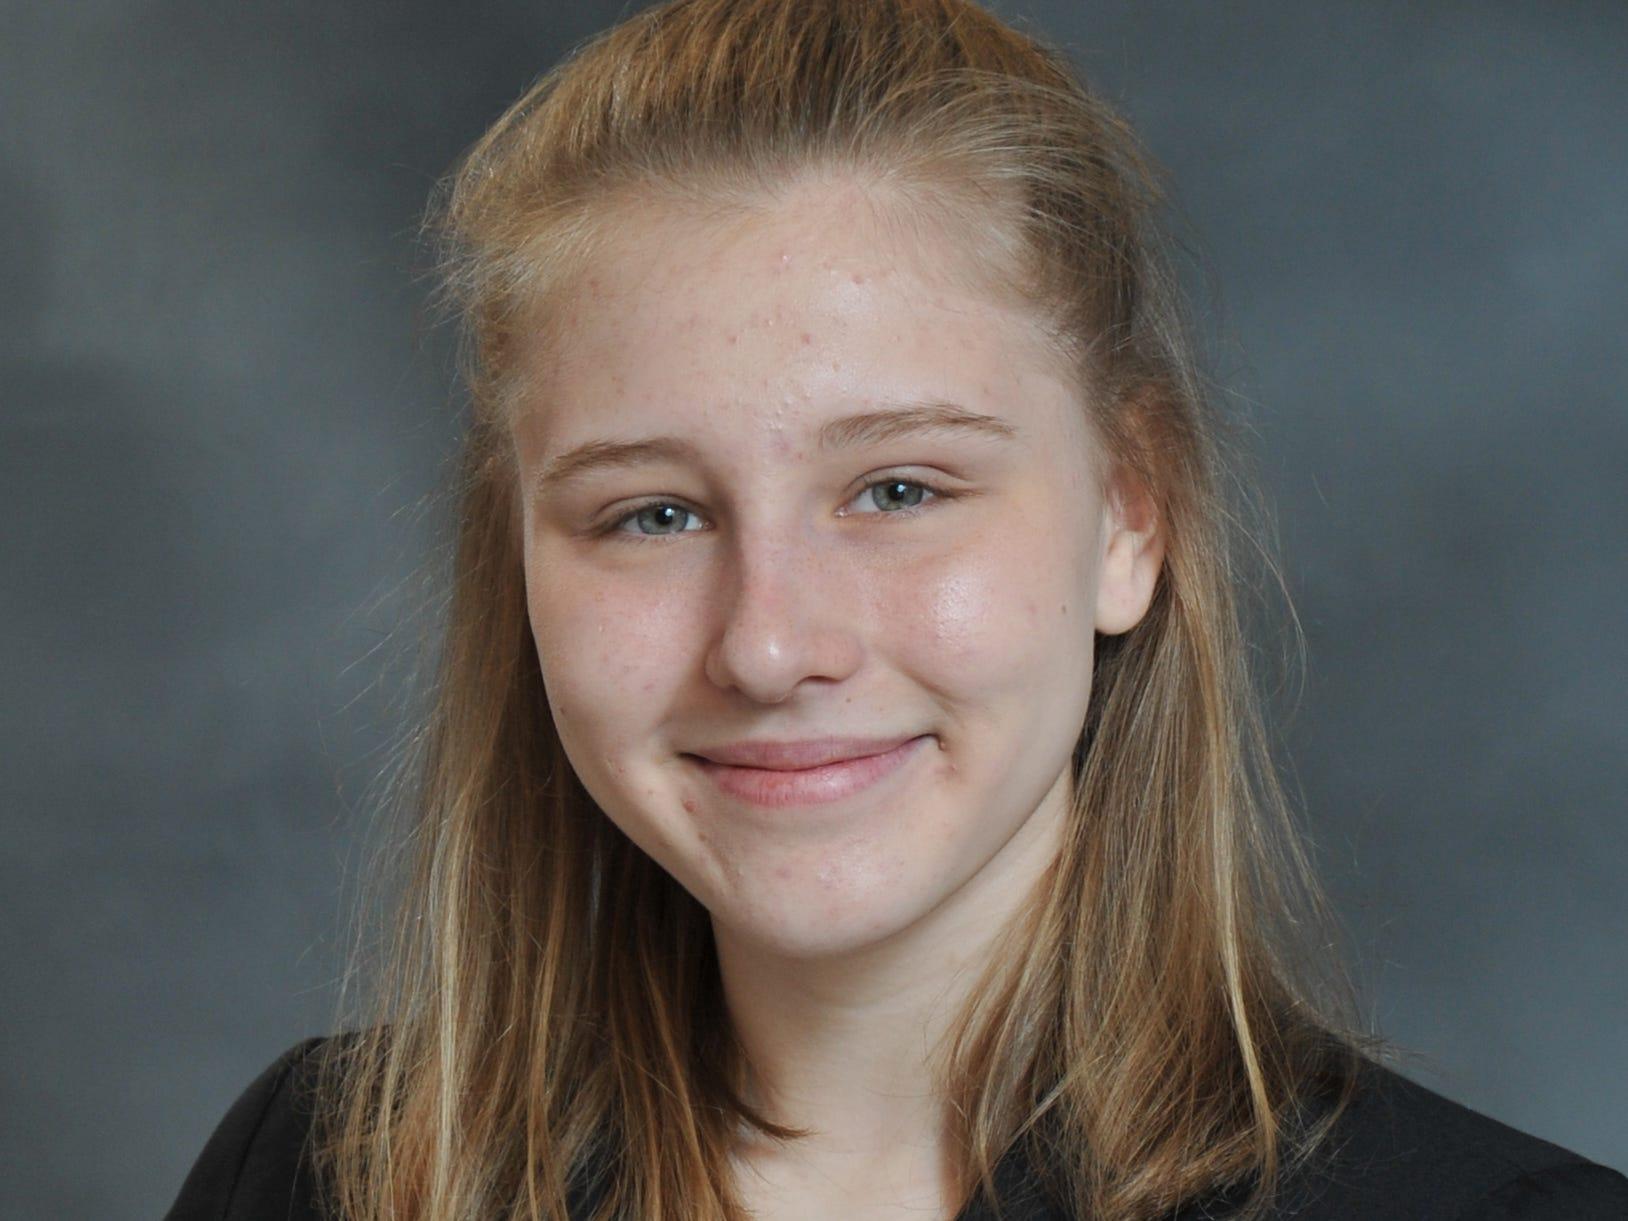 Chloe Barlett, Northeastern High School, Distinguished Young Women of York County participant.